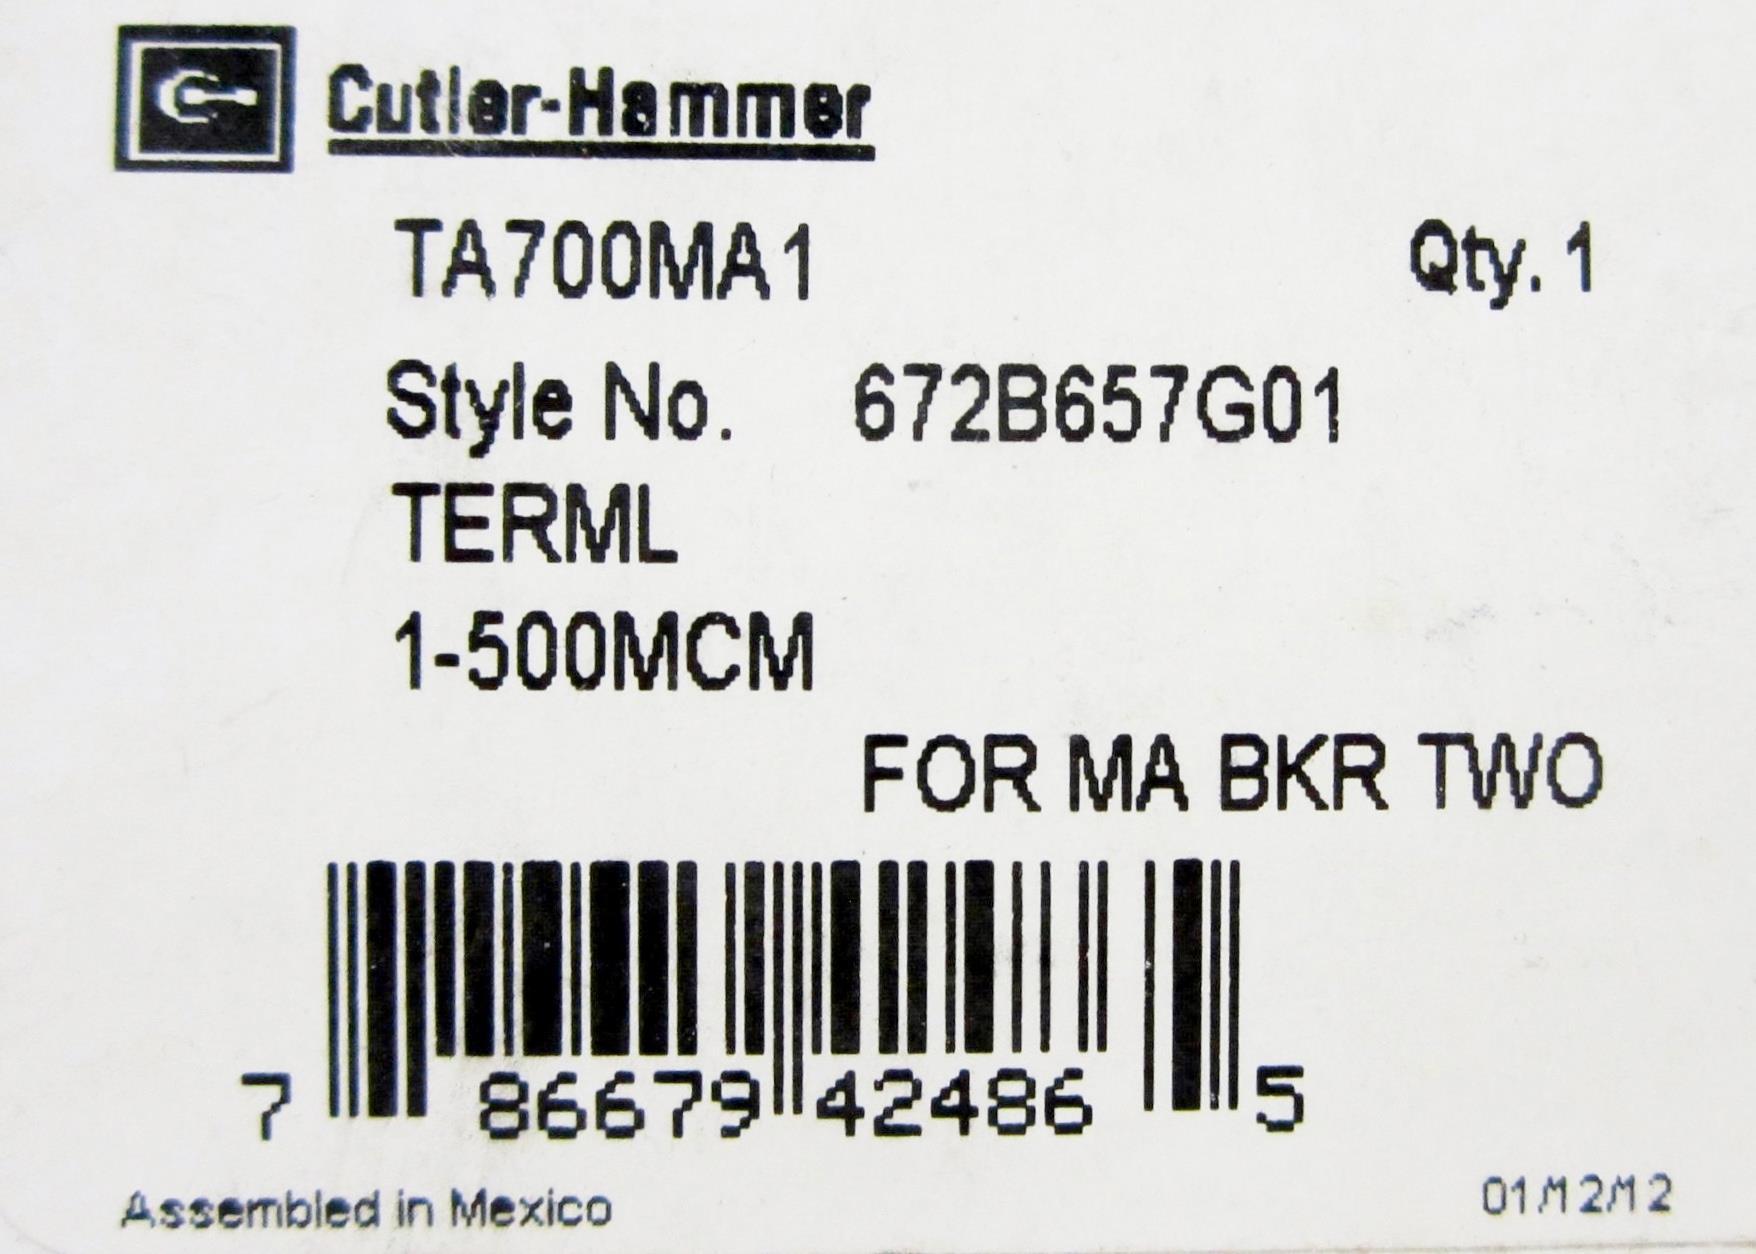 CUTLER HAMMER TA700MA1 CIRCUIT BREAKER LUG TERMINAL, LINE